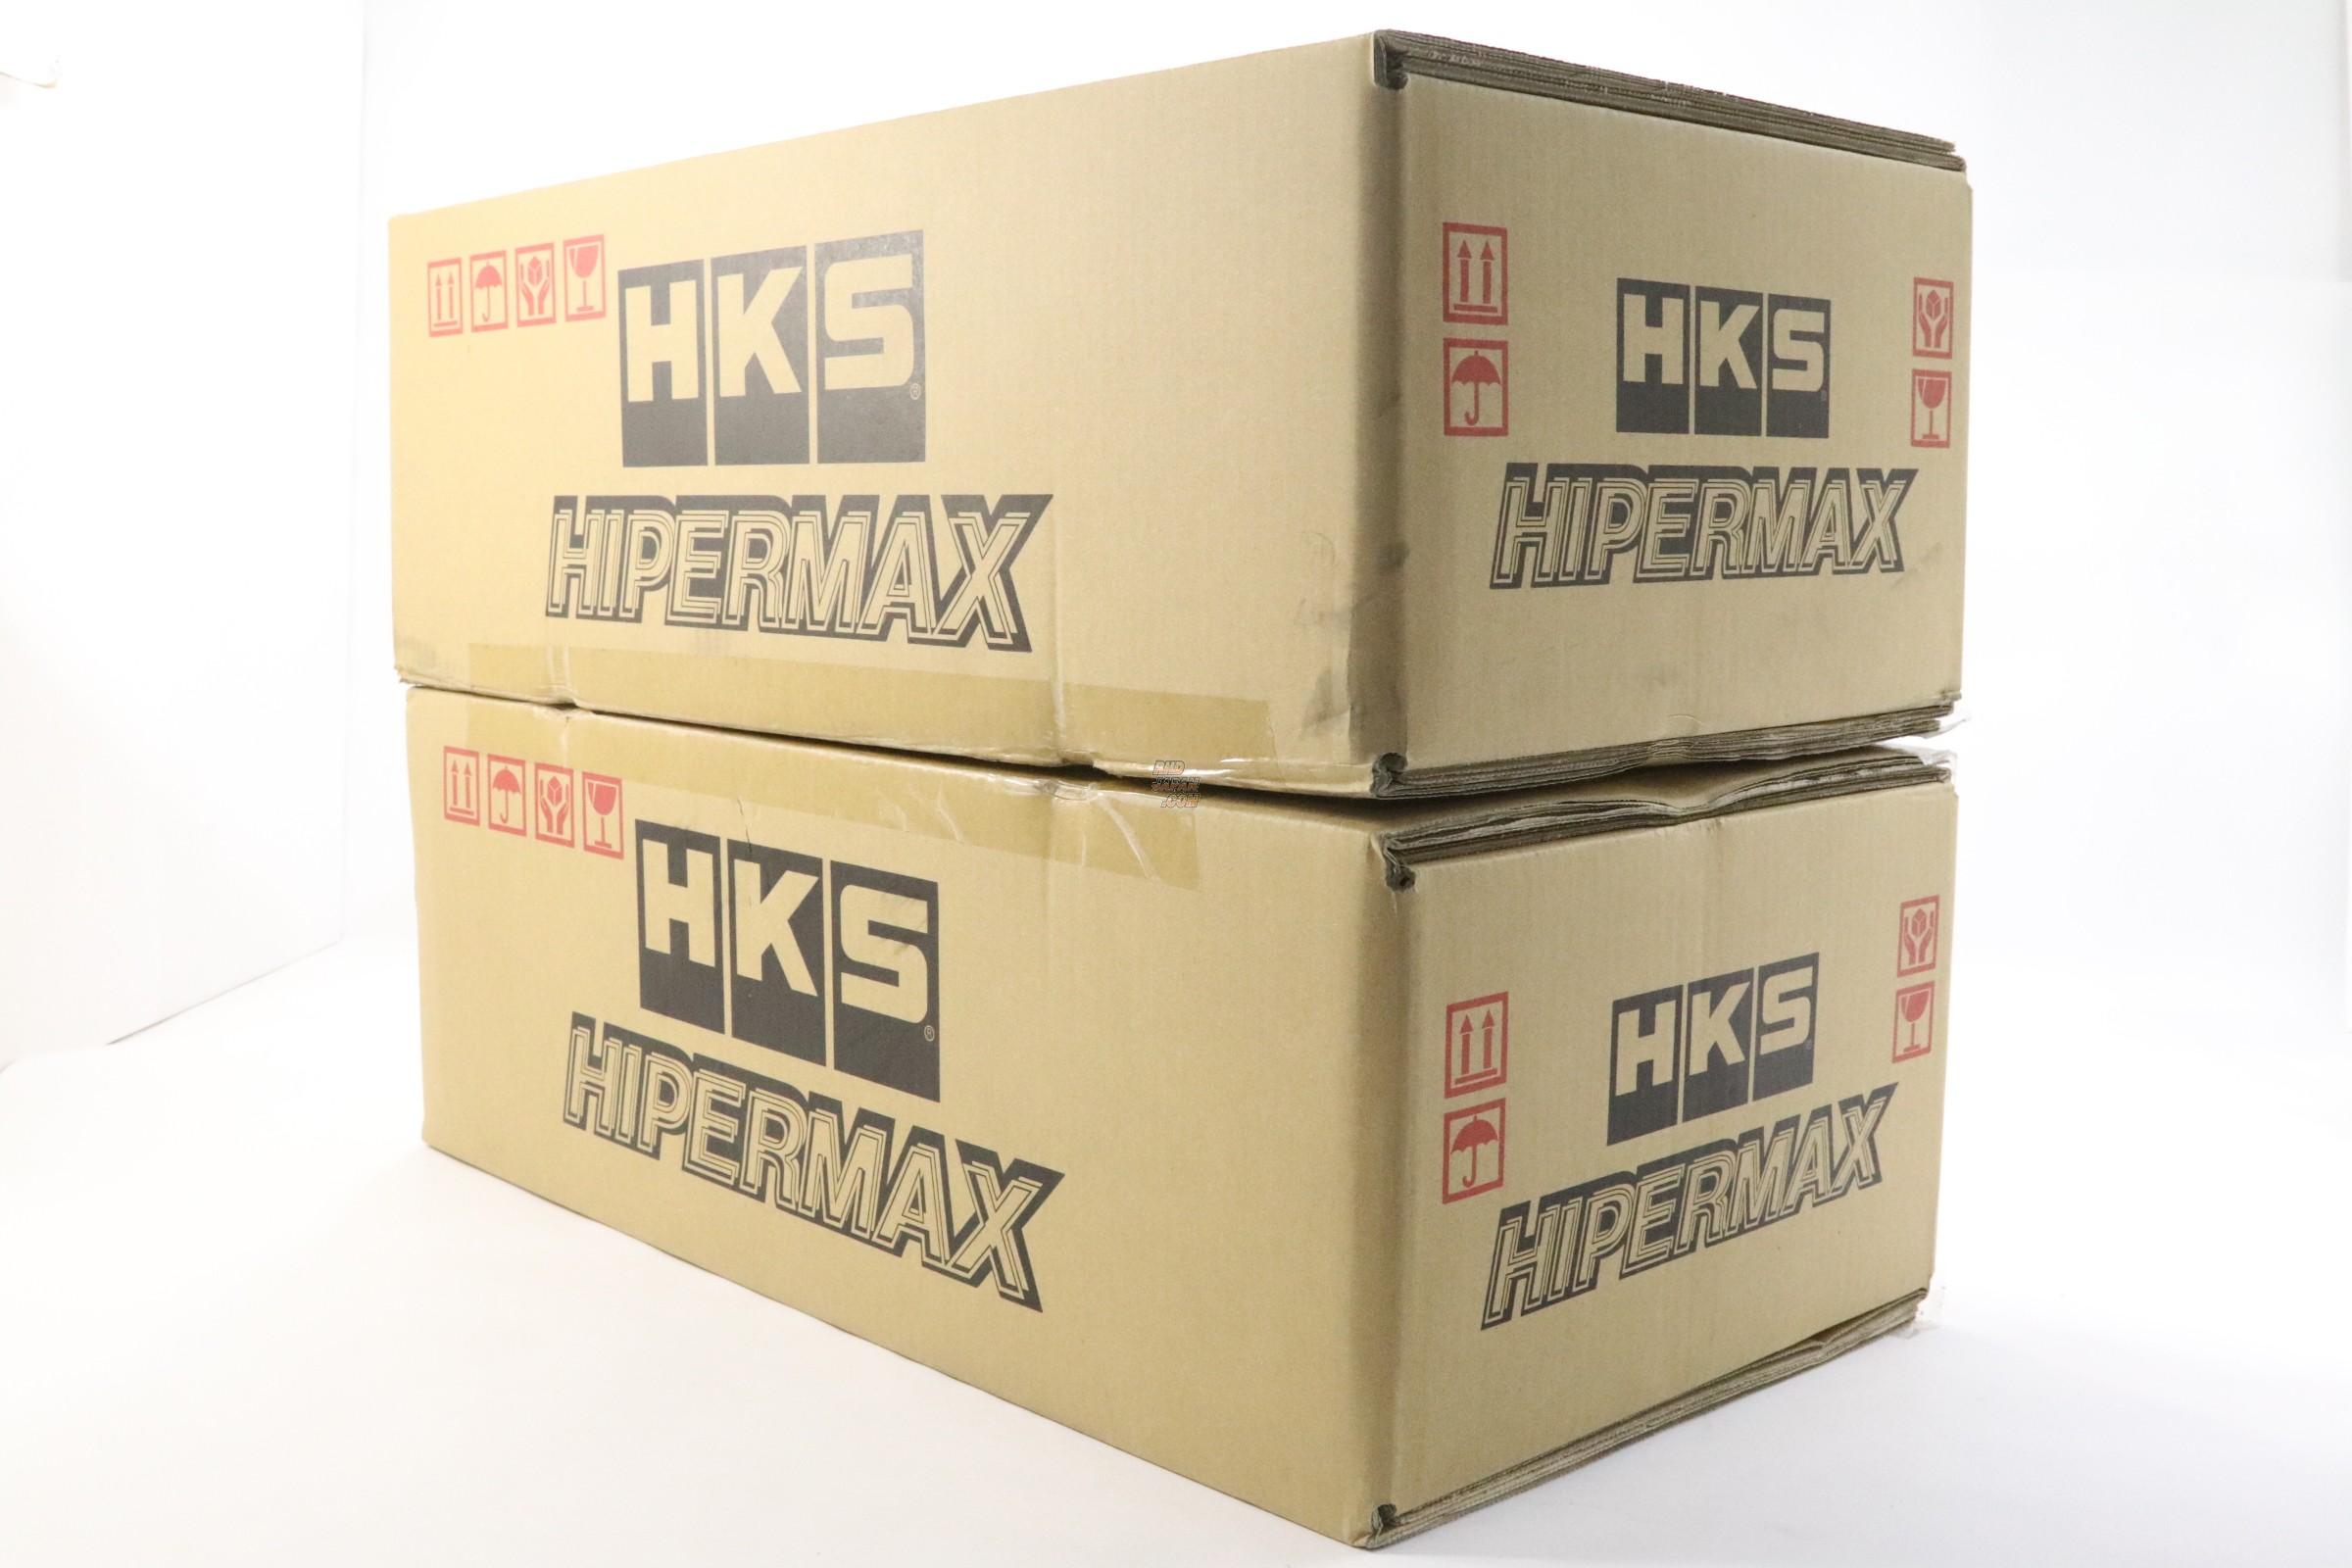 HKS Hipermax Coilover Suspension S-Style X - UZS175 JZS177